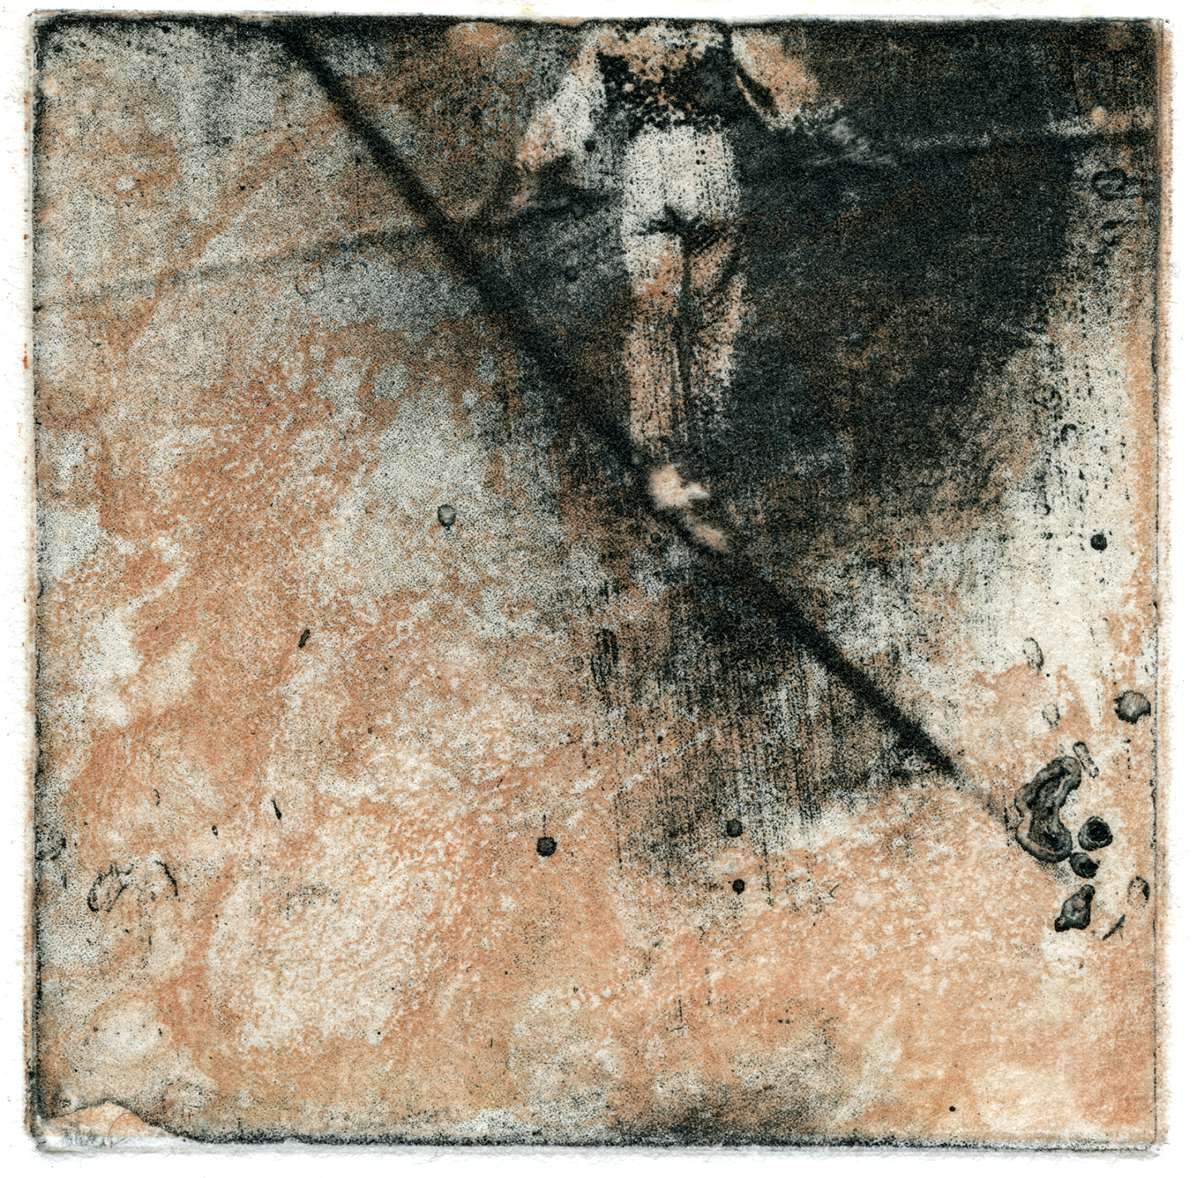 Miniprints - Glance:photo etch,intaglio, chine collé, 4